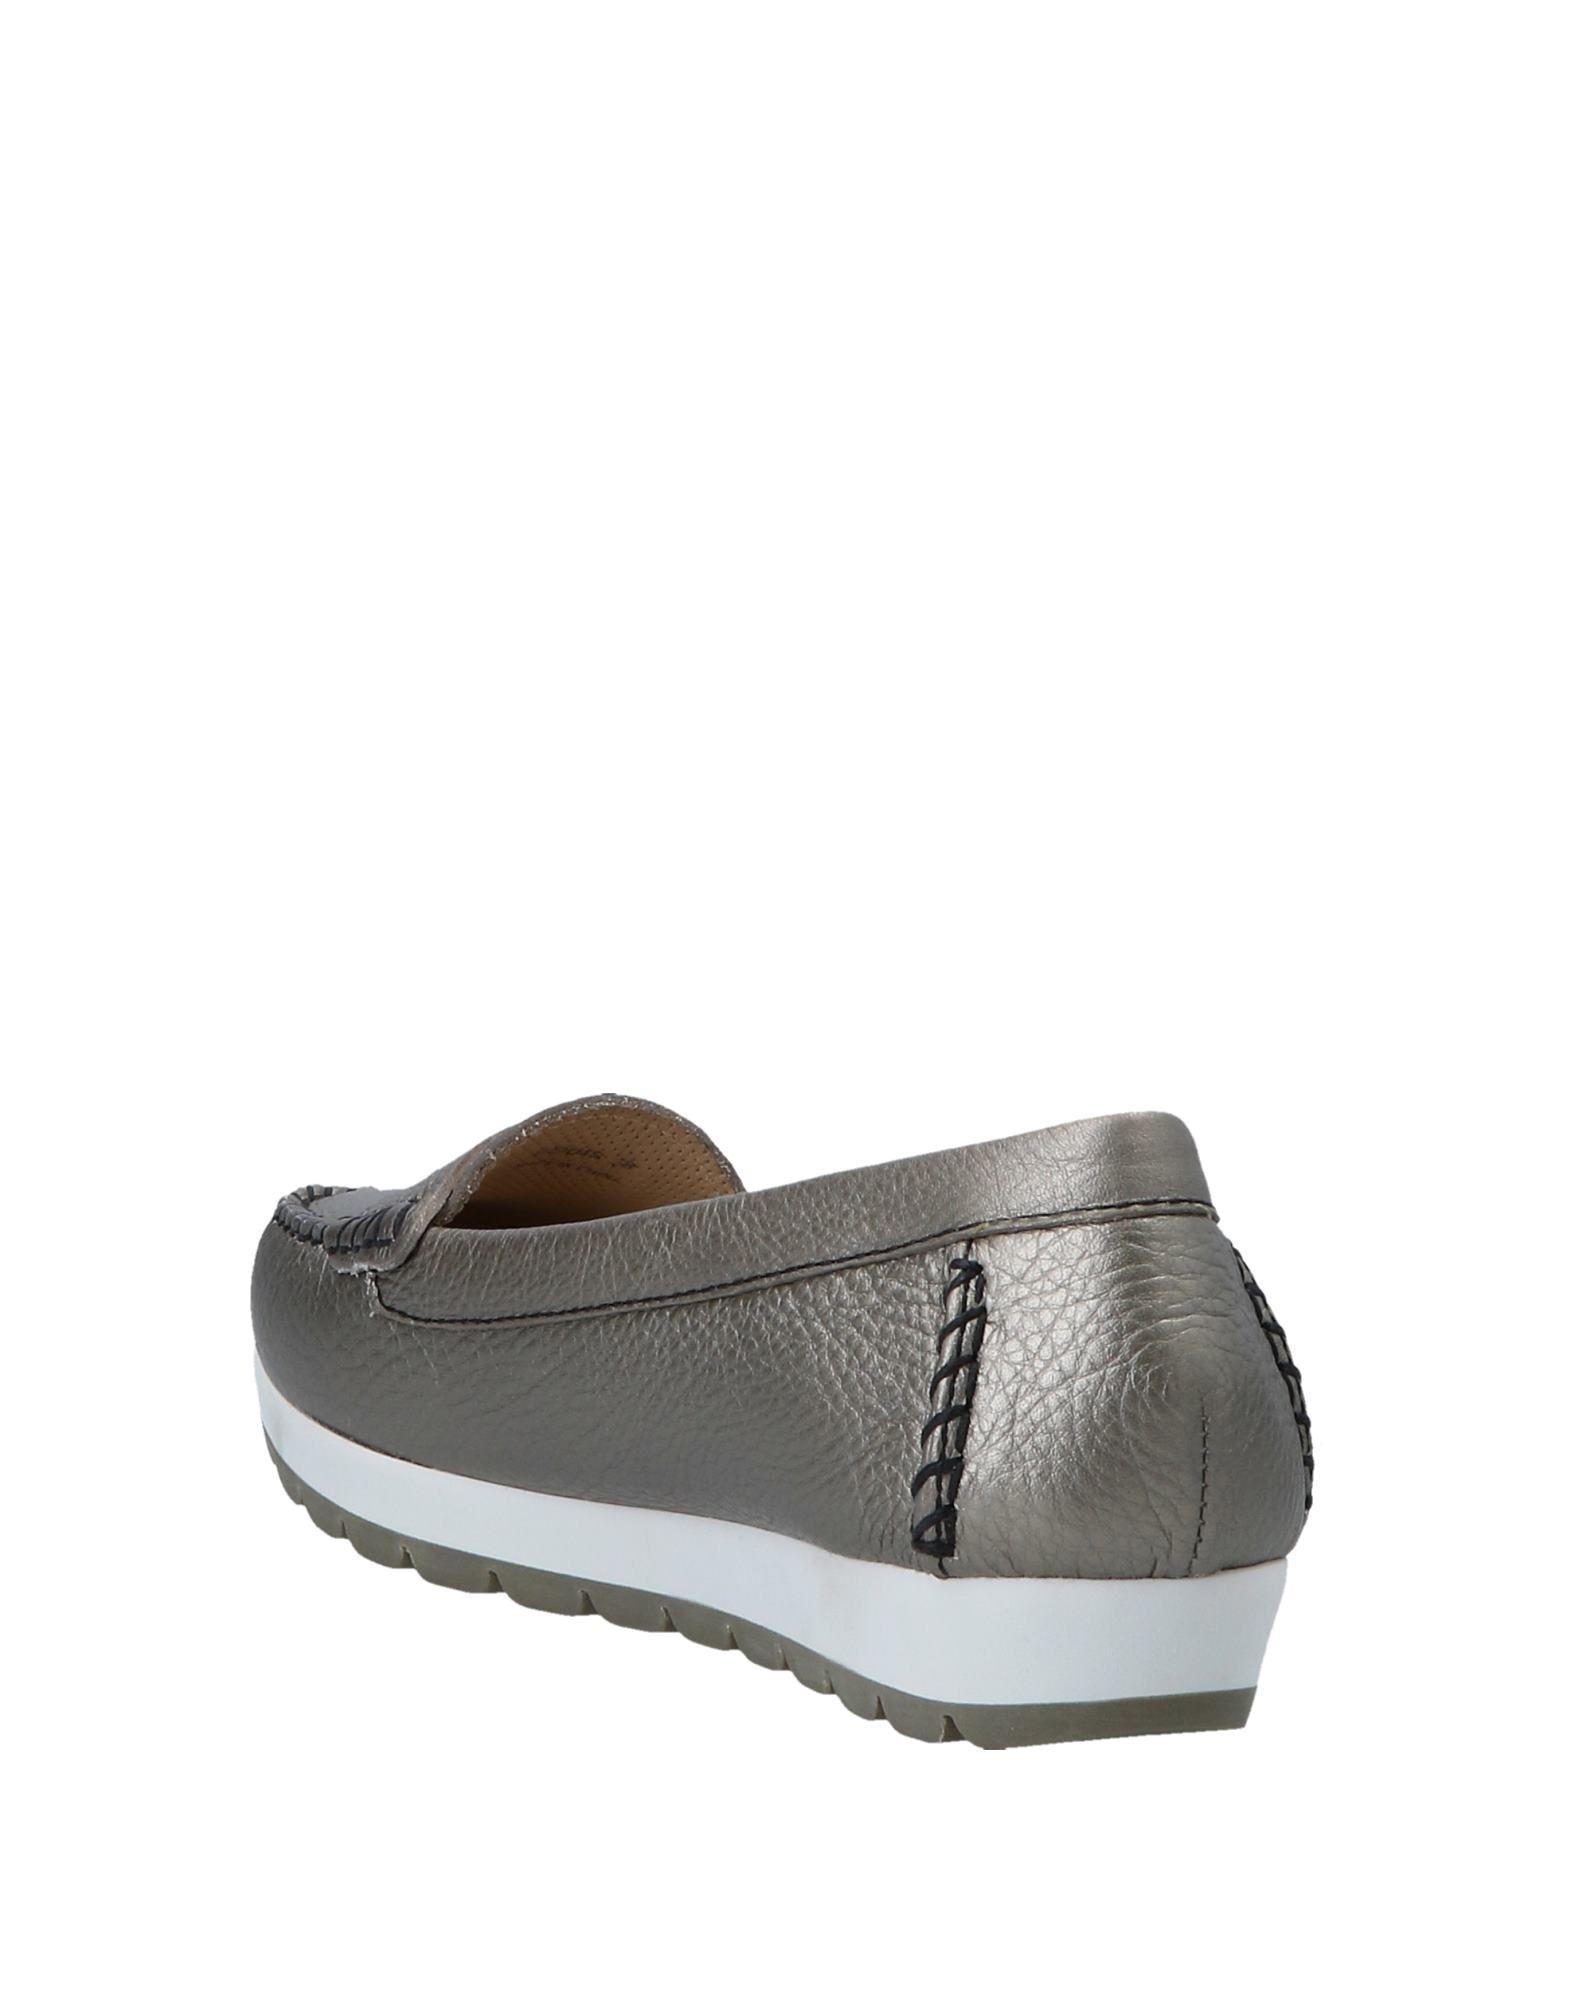 Geox 11547813DH Mokassins Damen  11547813DH Geox Gute Qualität beliebte Schuhe f87fc3